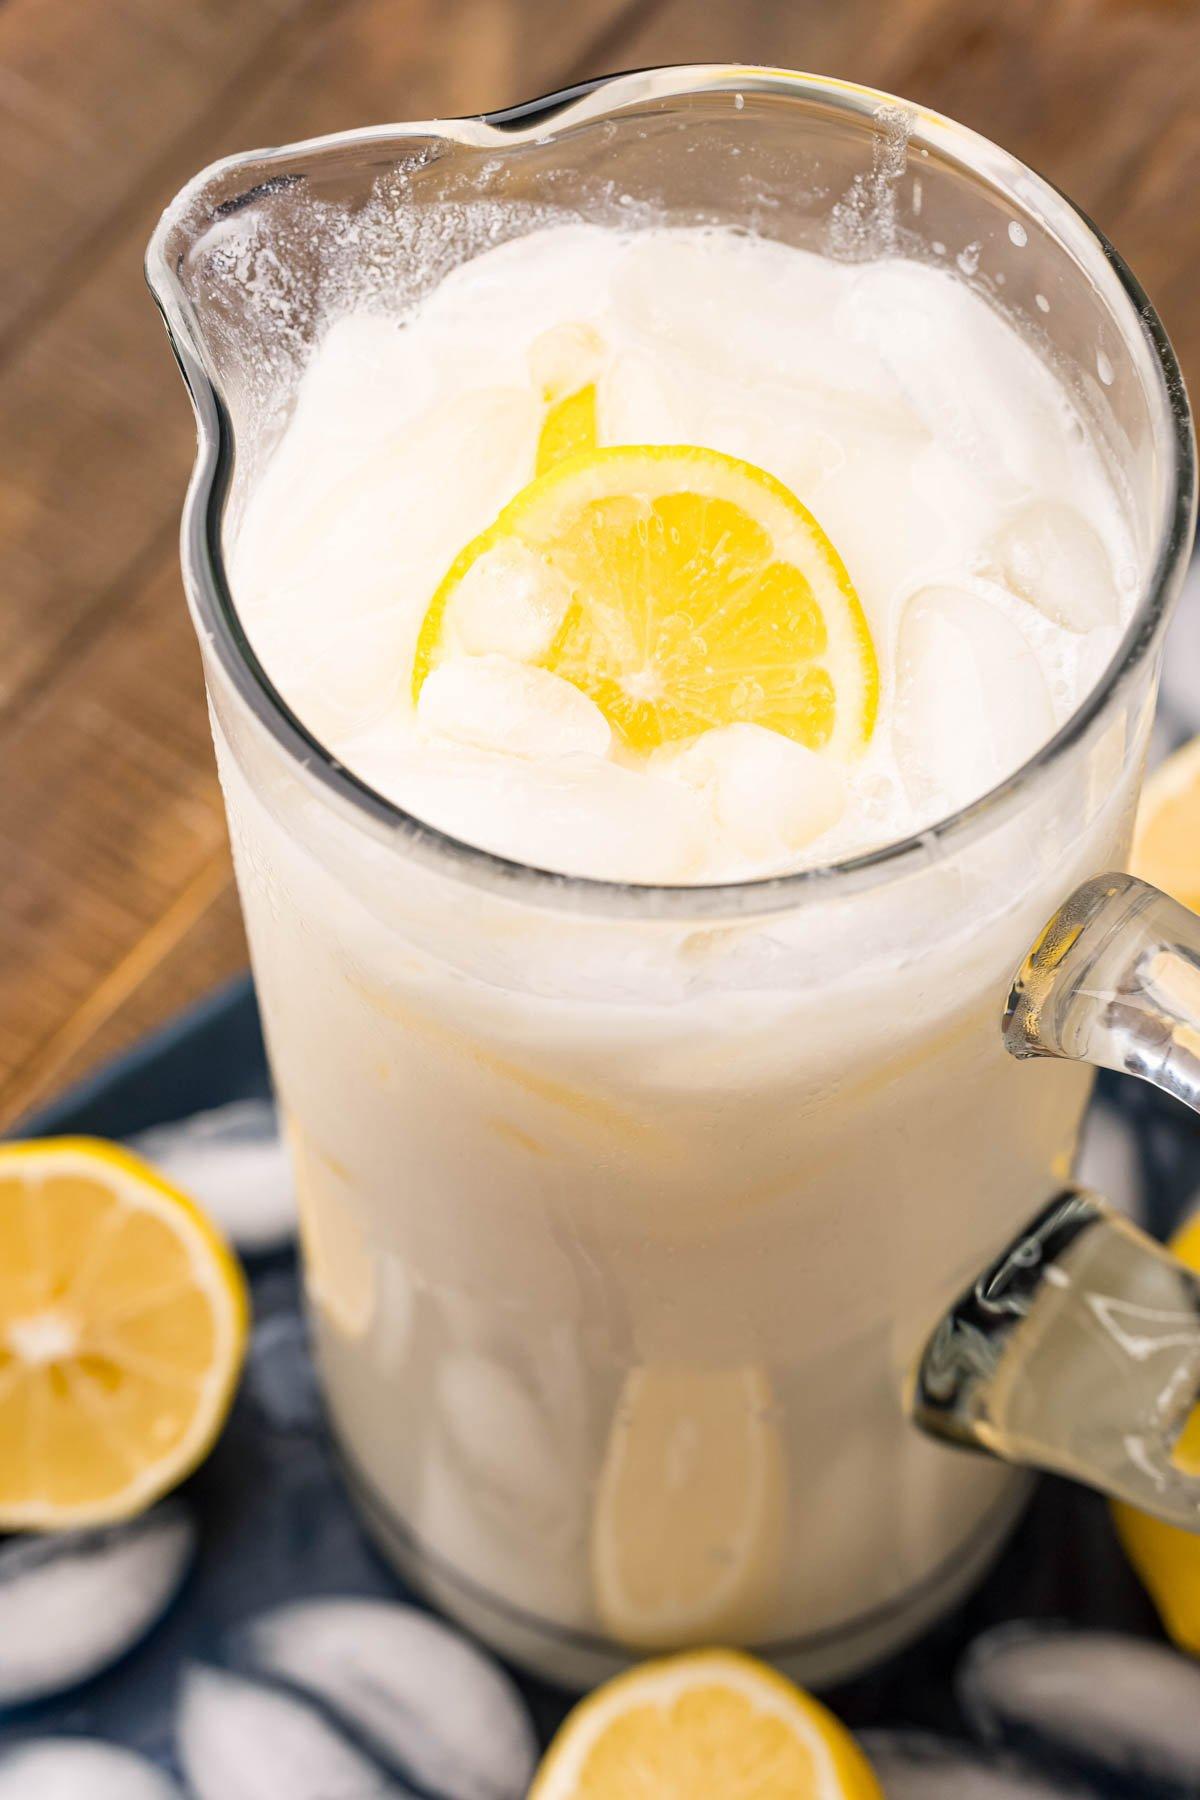 pitcher of creamy lemonade